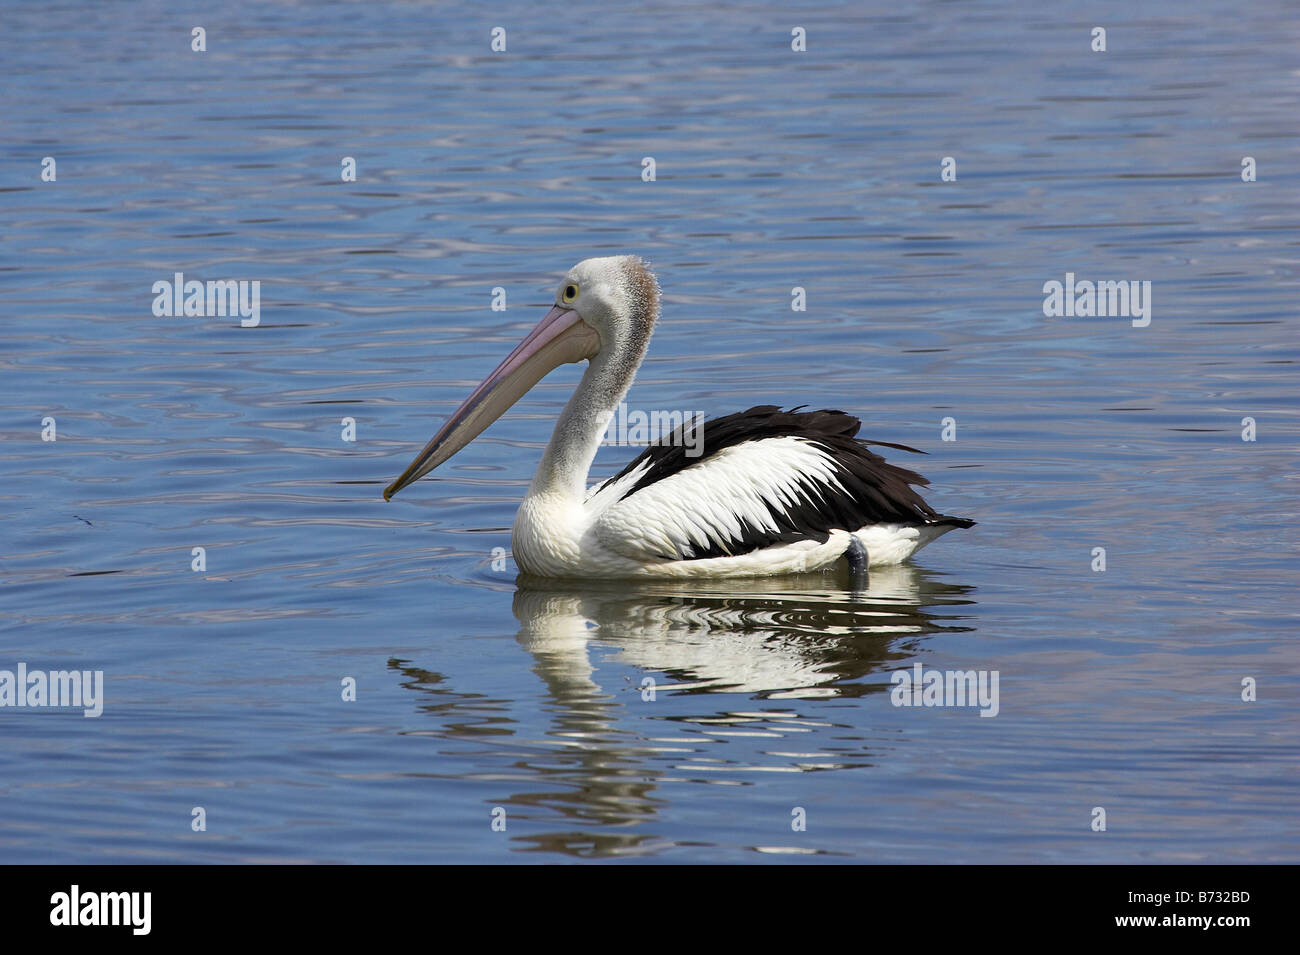 Pelican Nambucca River Macksville New South Wales Australia - Stock Image